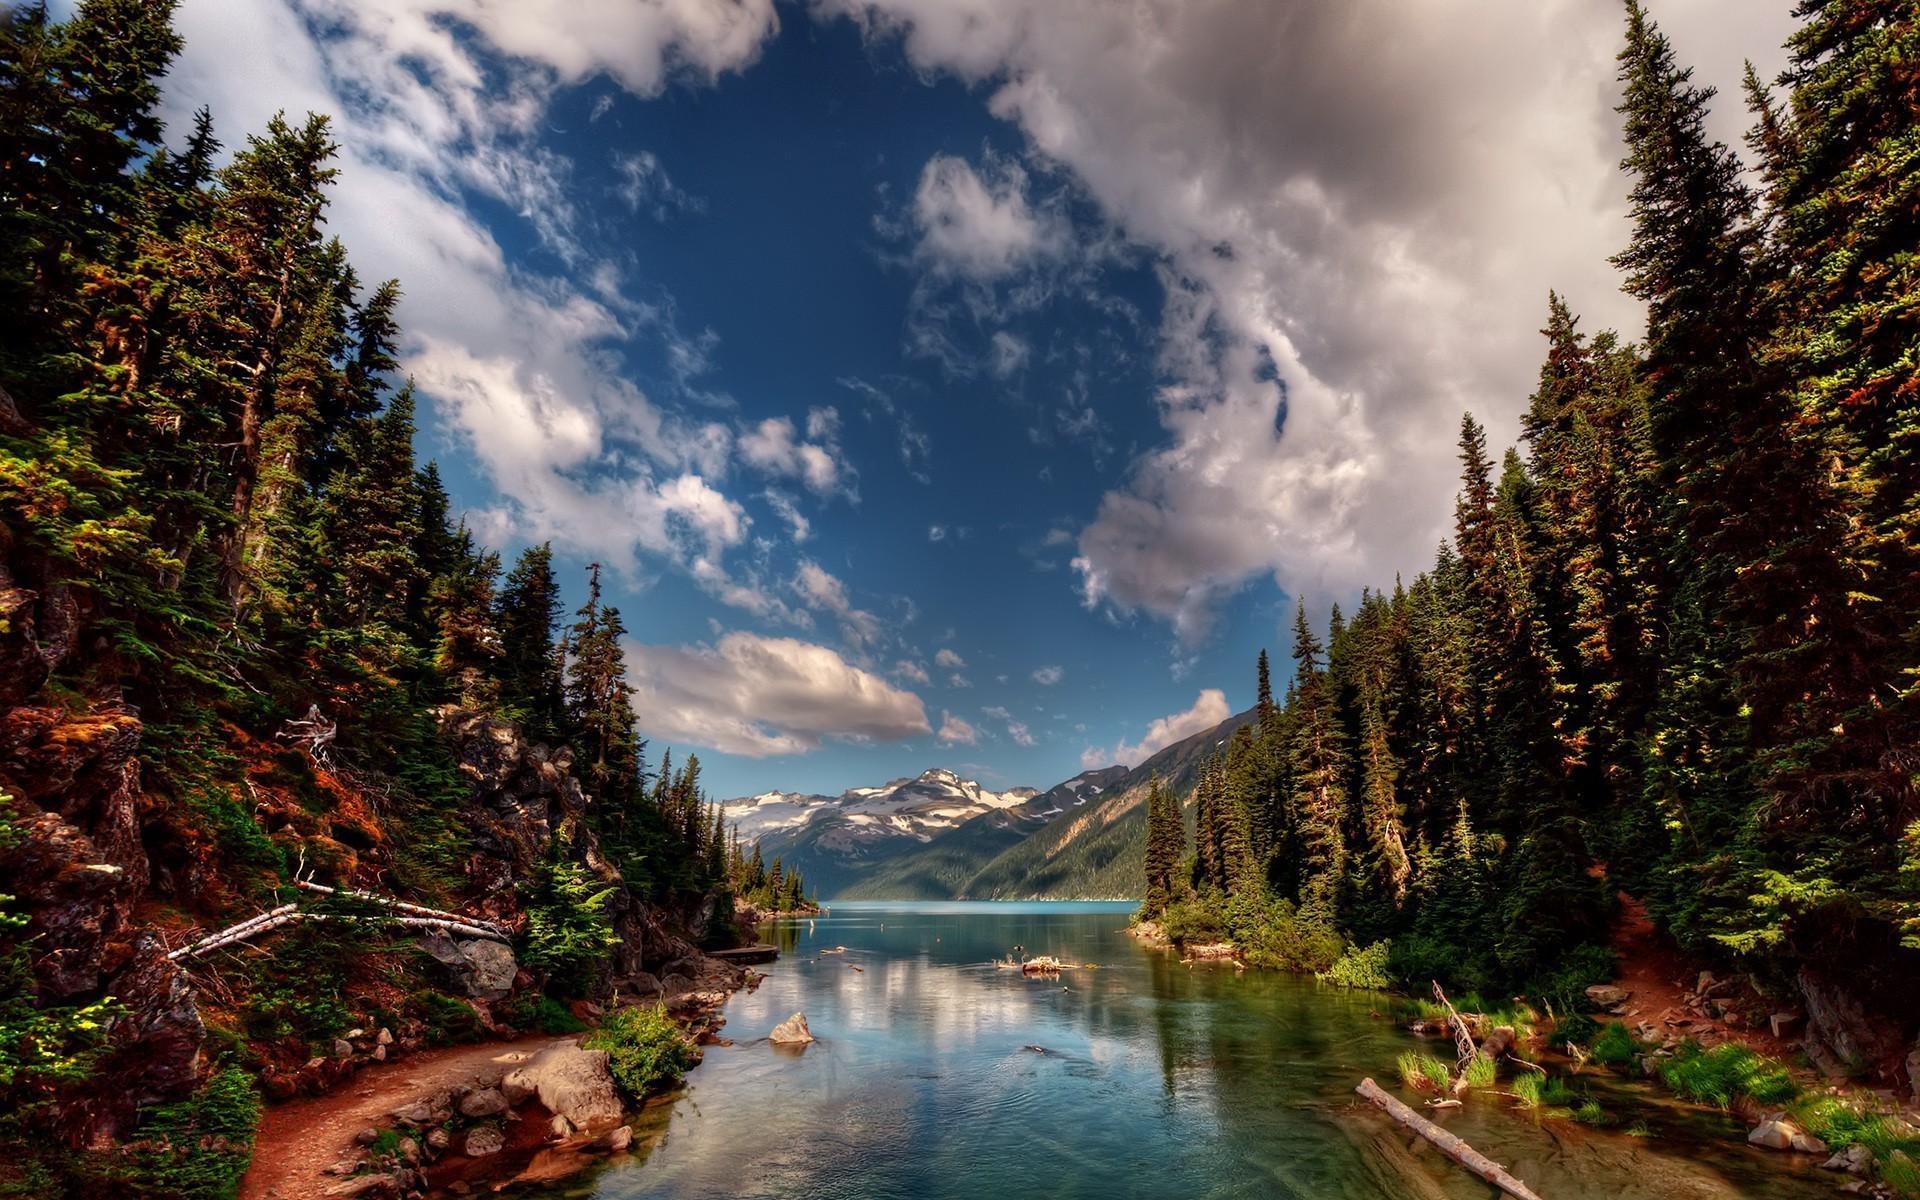 Yellowstone National Park Background 1920x1200